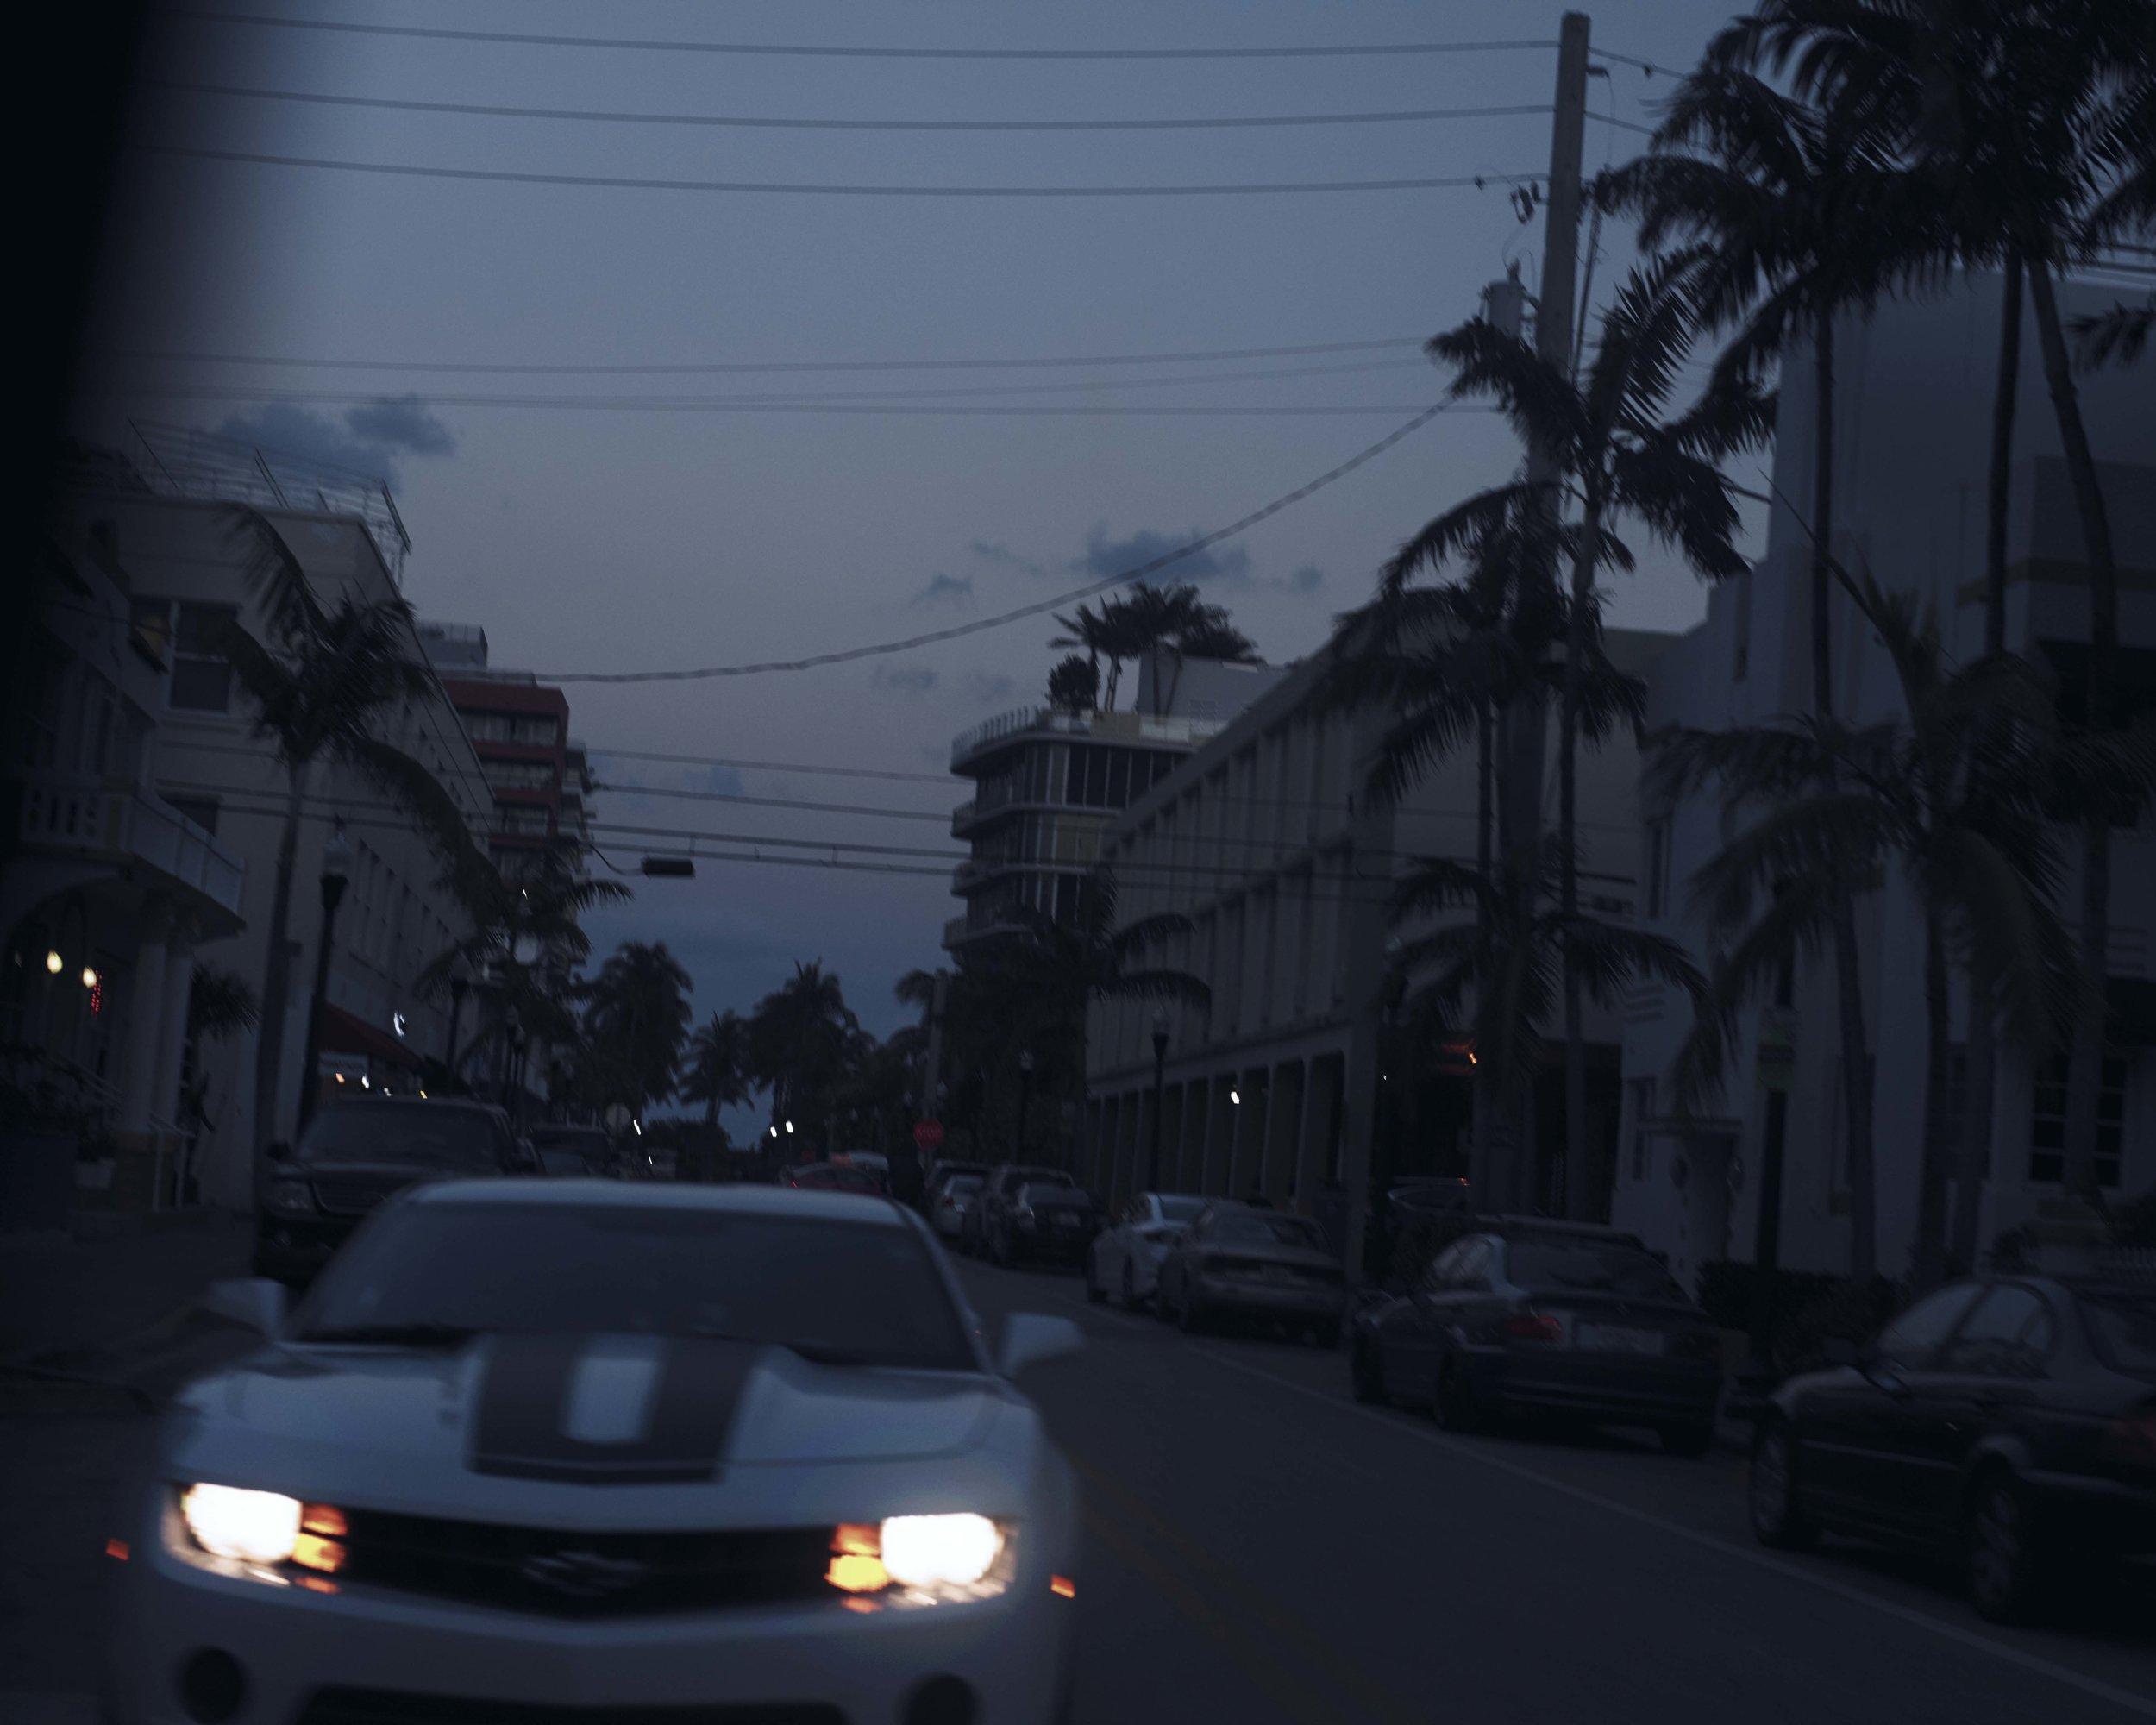 PARKER_Miami_3.JPG